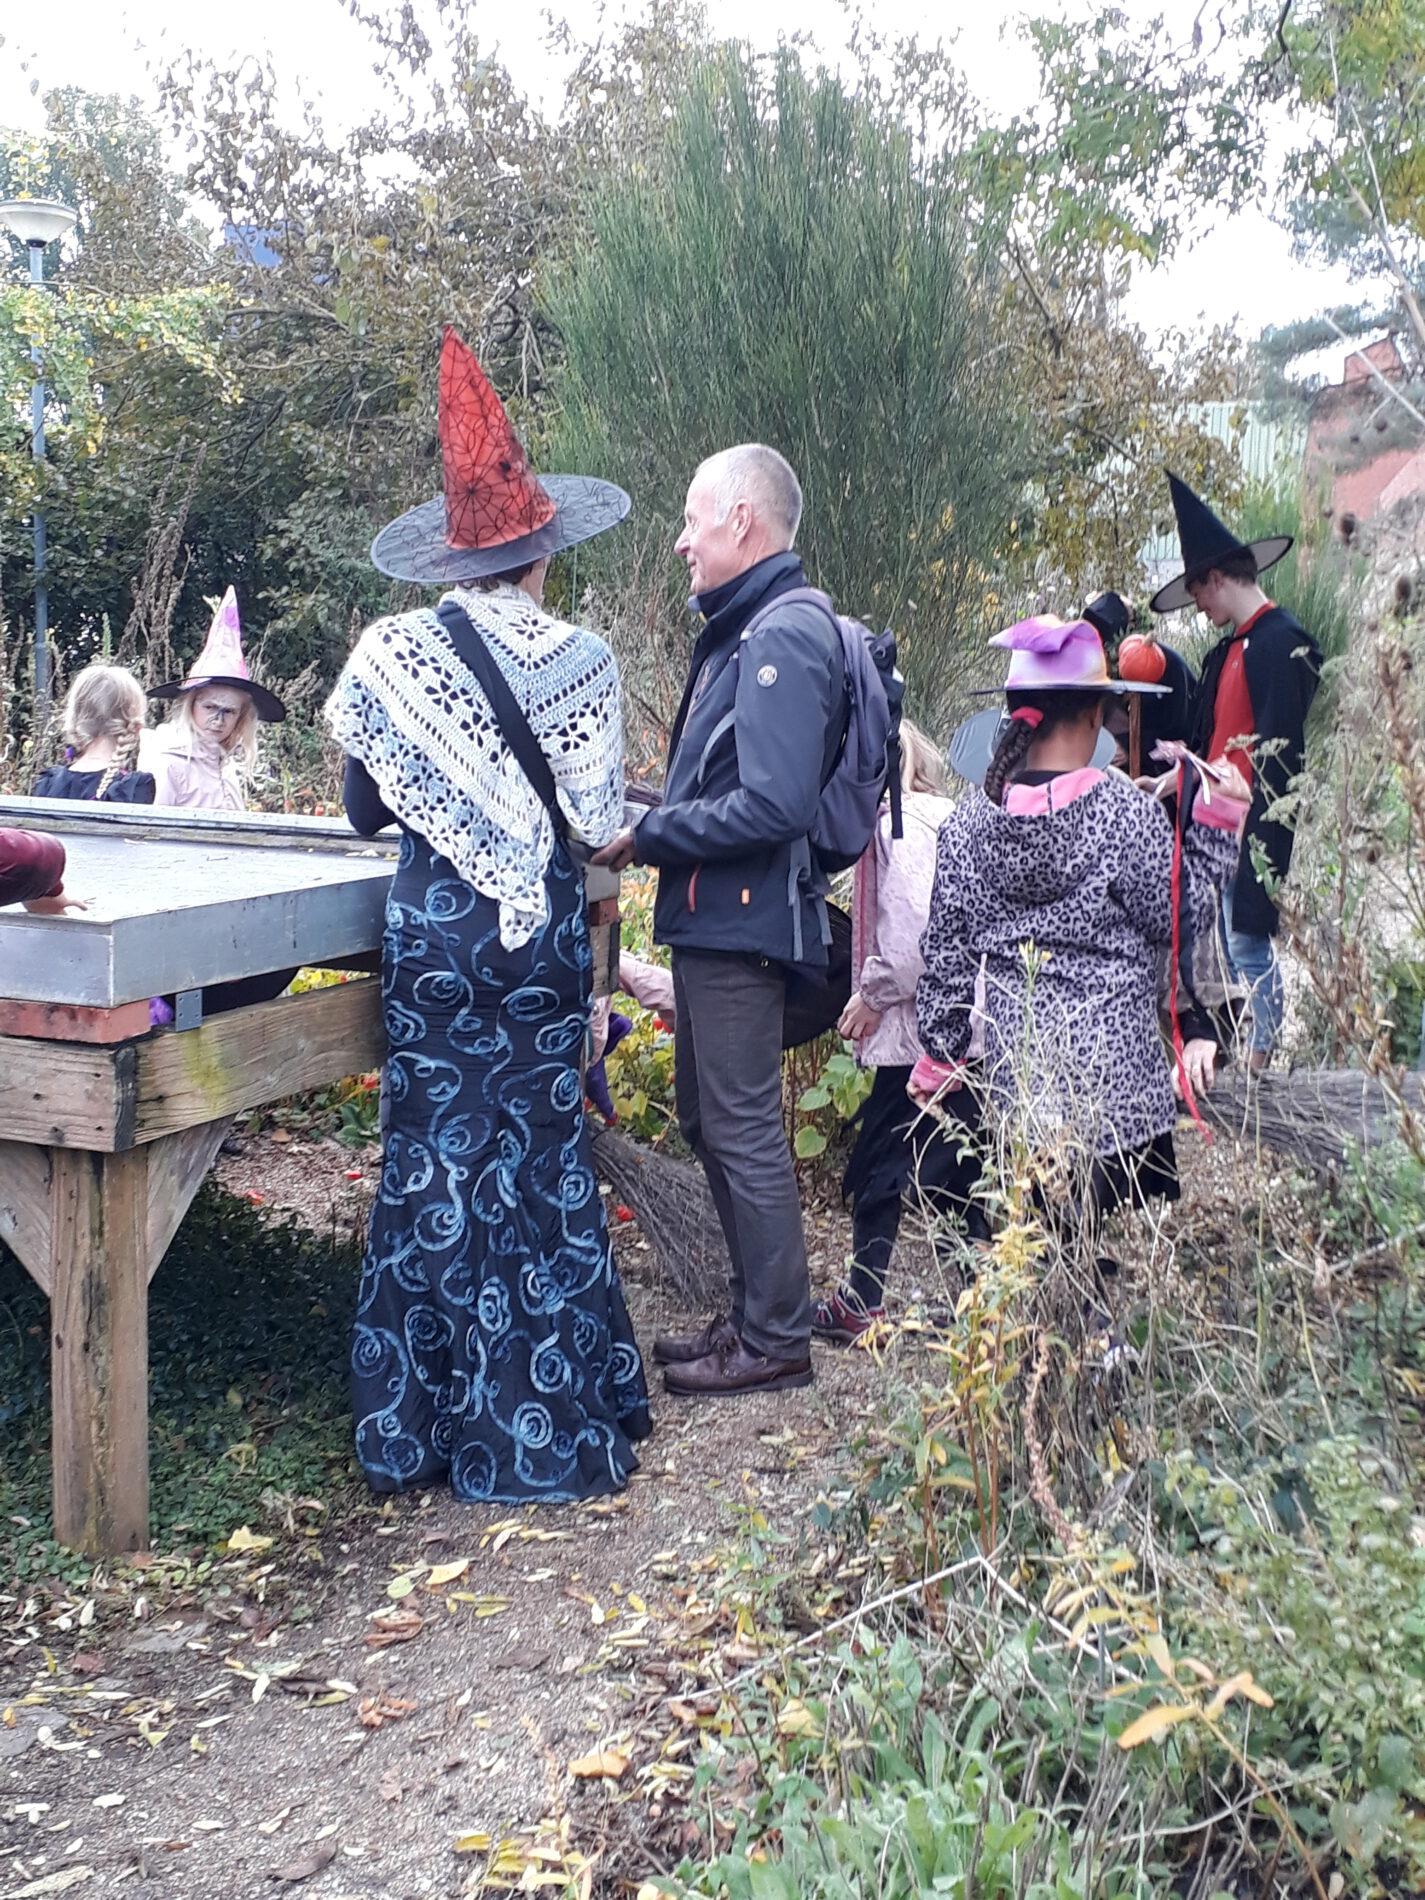 Kinderrondleiding: ga je mee op heksentour?